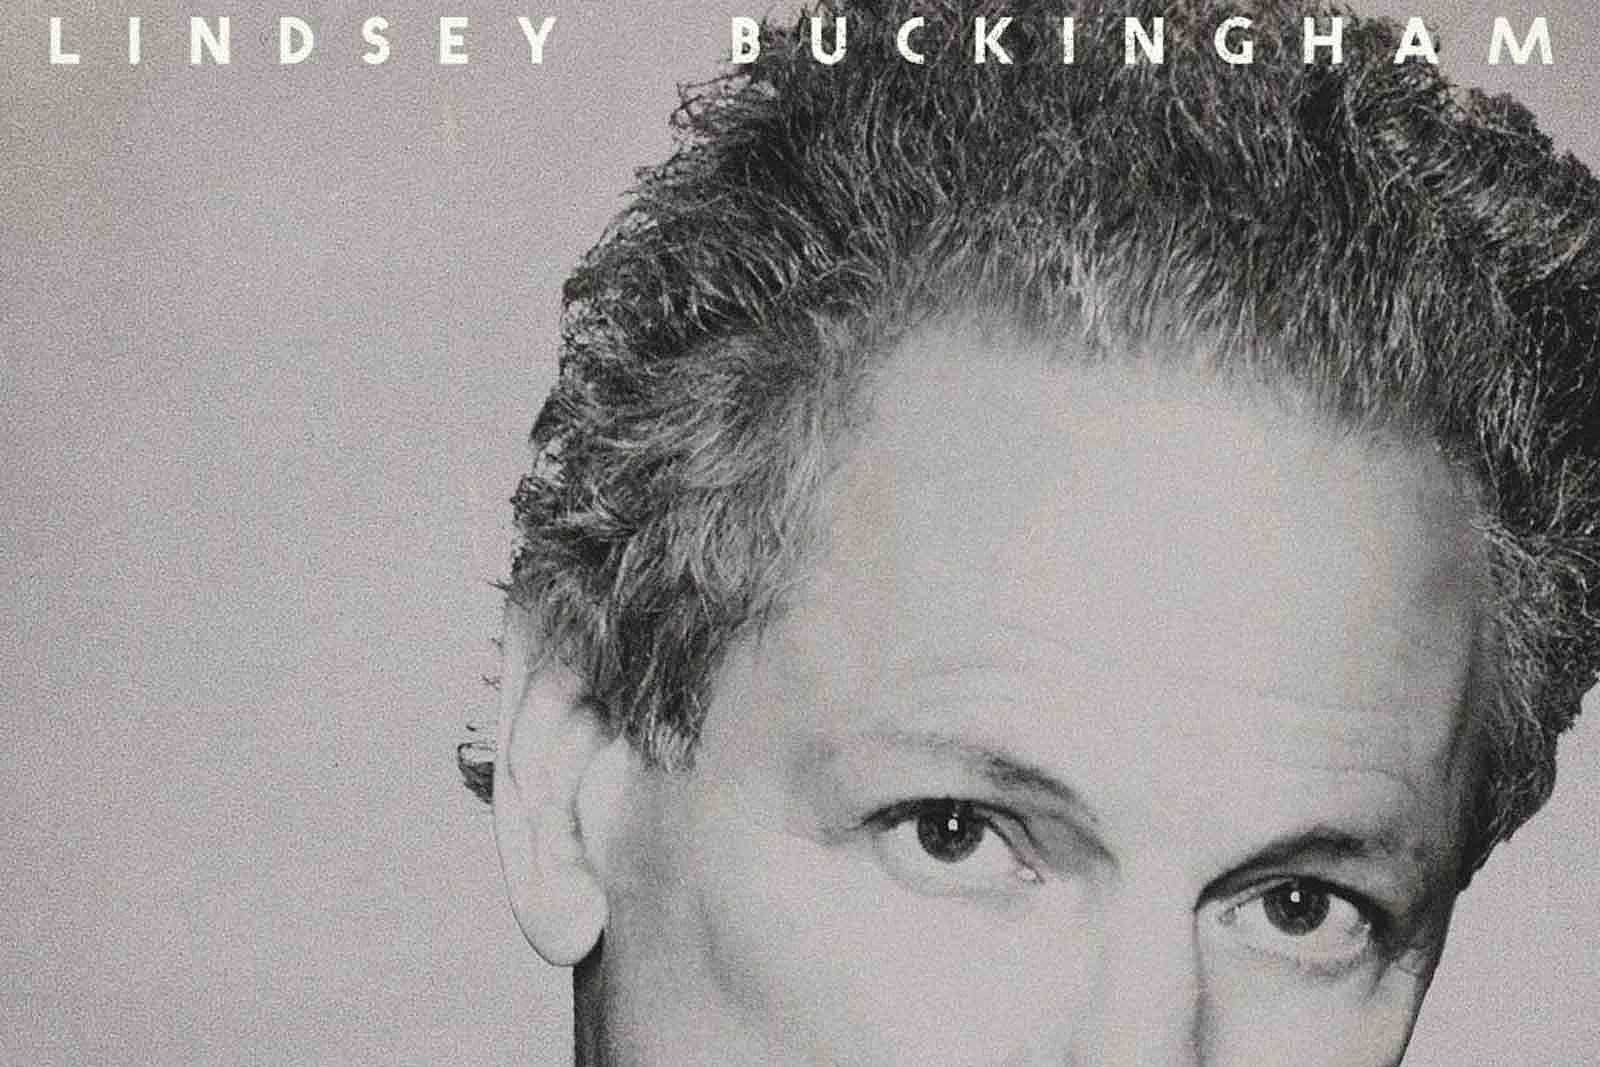 Lindsey Buckingham, 'Lindsey Buckingham': Album Review